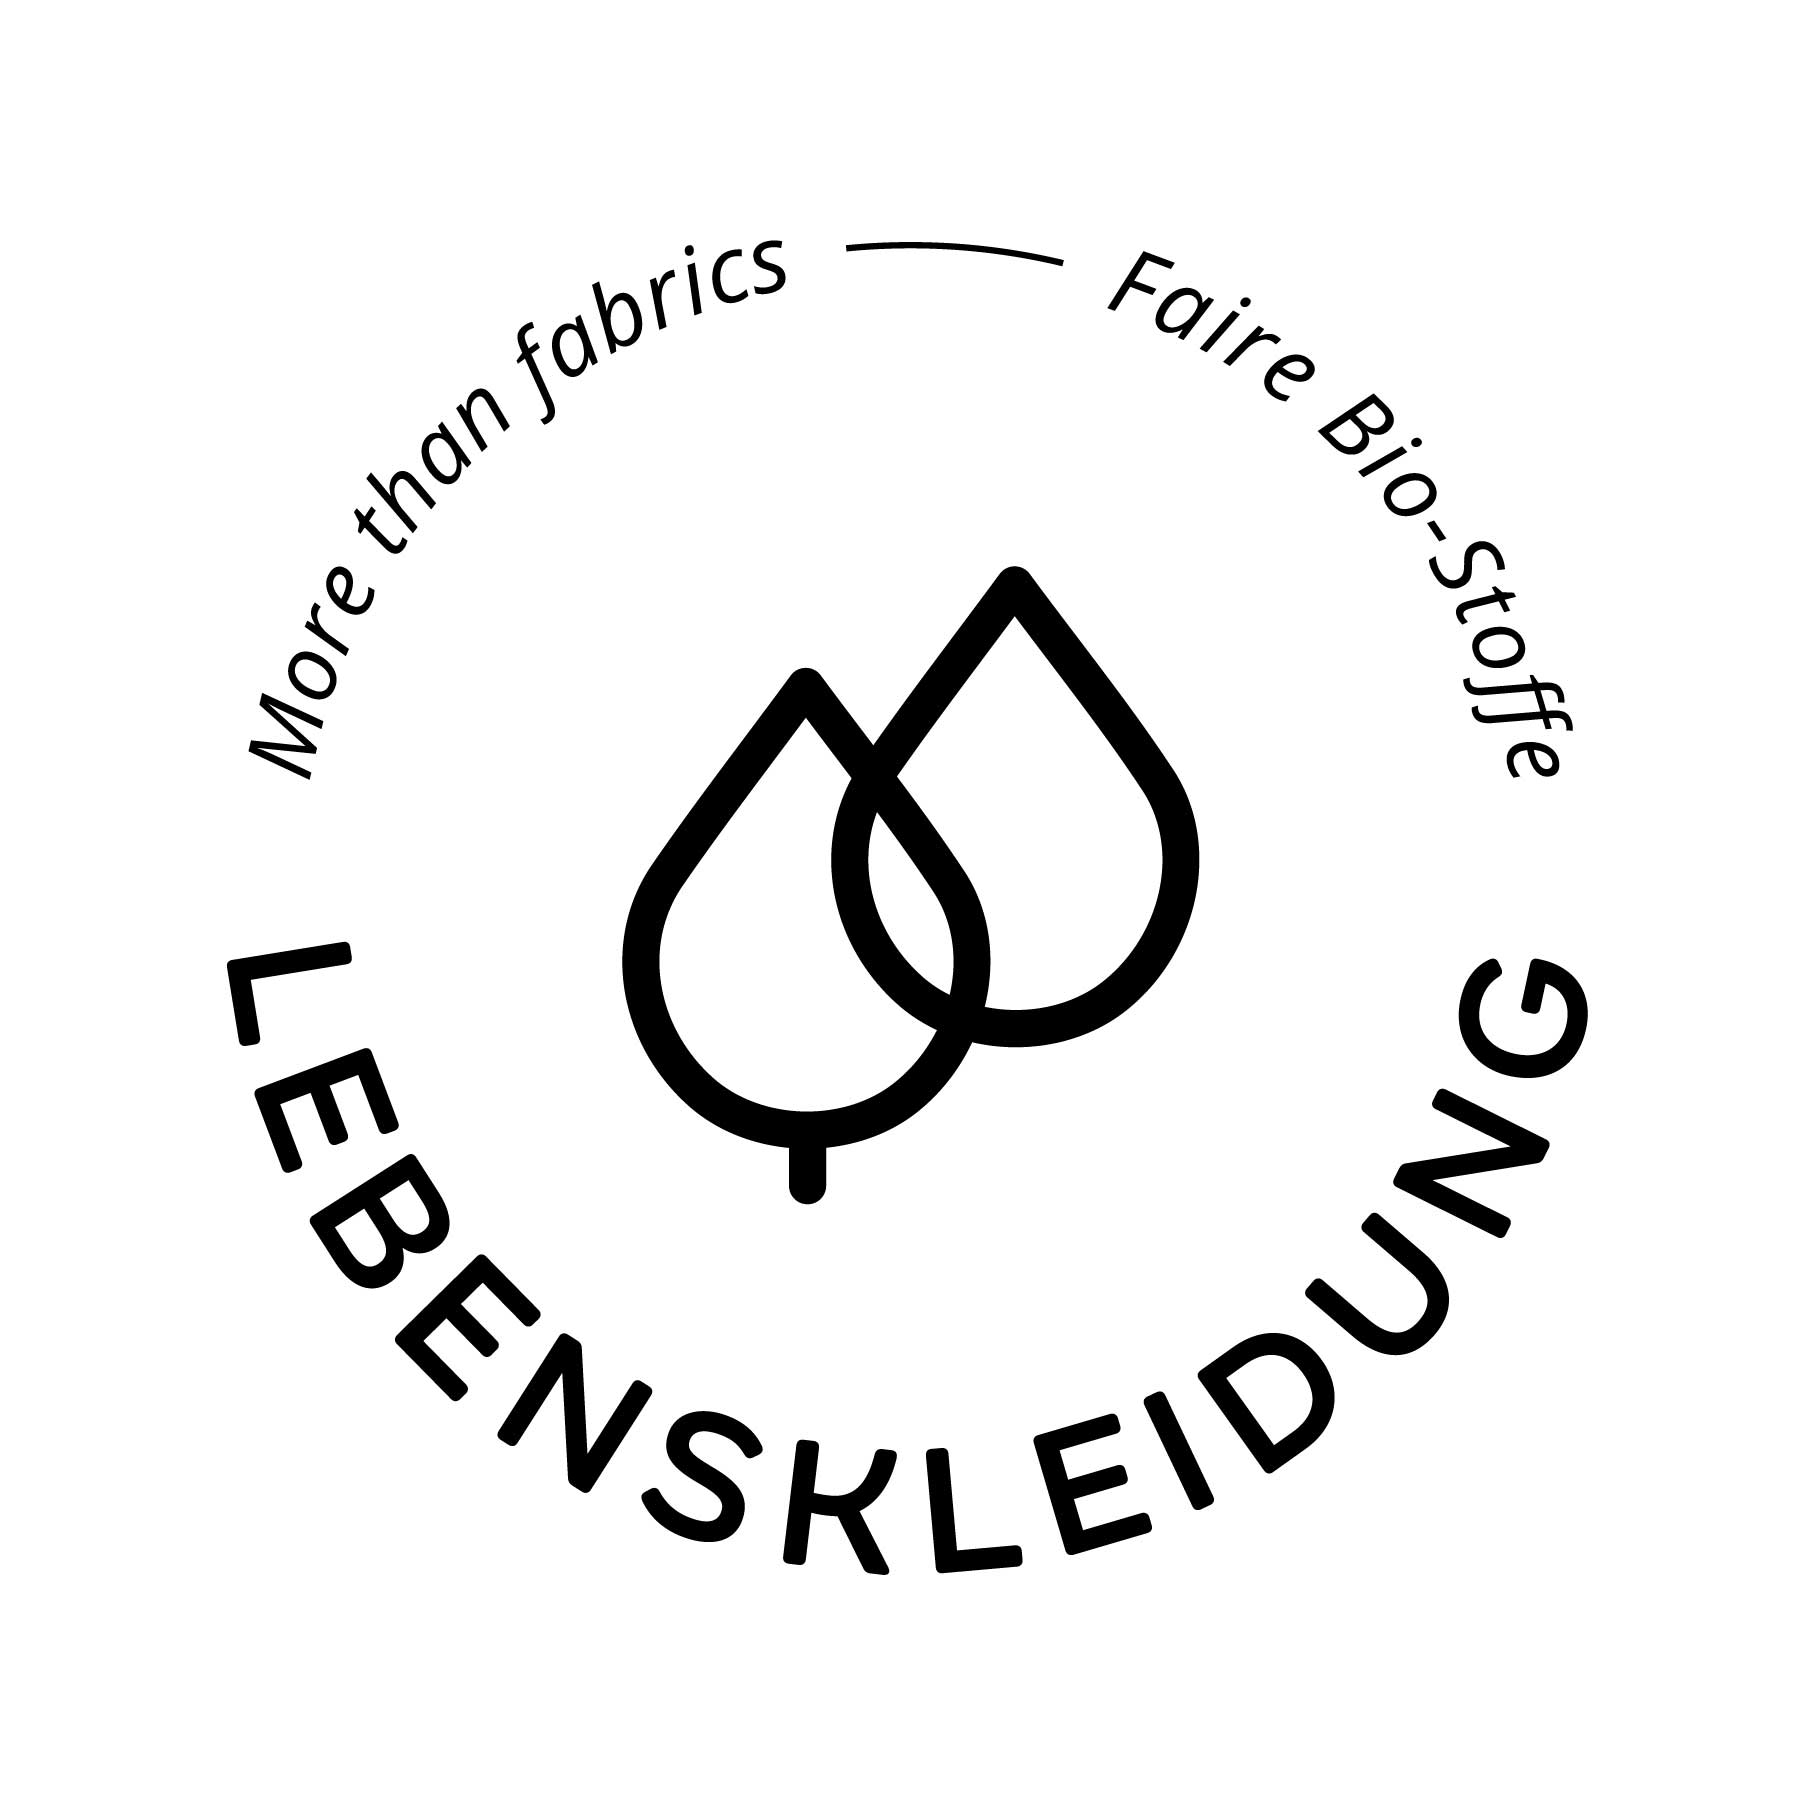 Tela orgánica Banda de goma elástica - 59% Bio Baumwolle 41% Naturkautschuk -  adecuado para telas de peso ligero a medio - 9,5 mm -  Ecru  - 100 Metros-2